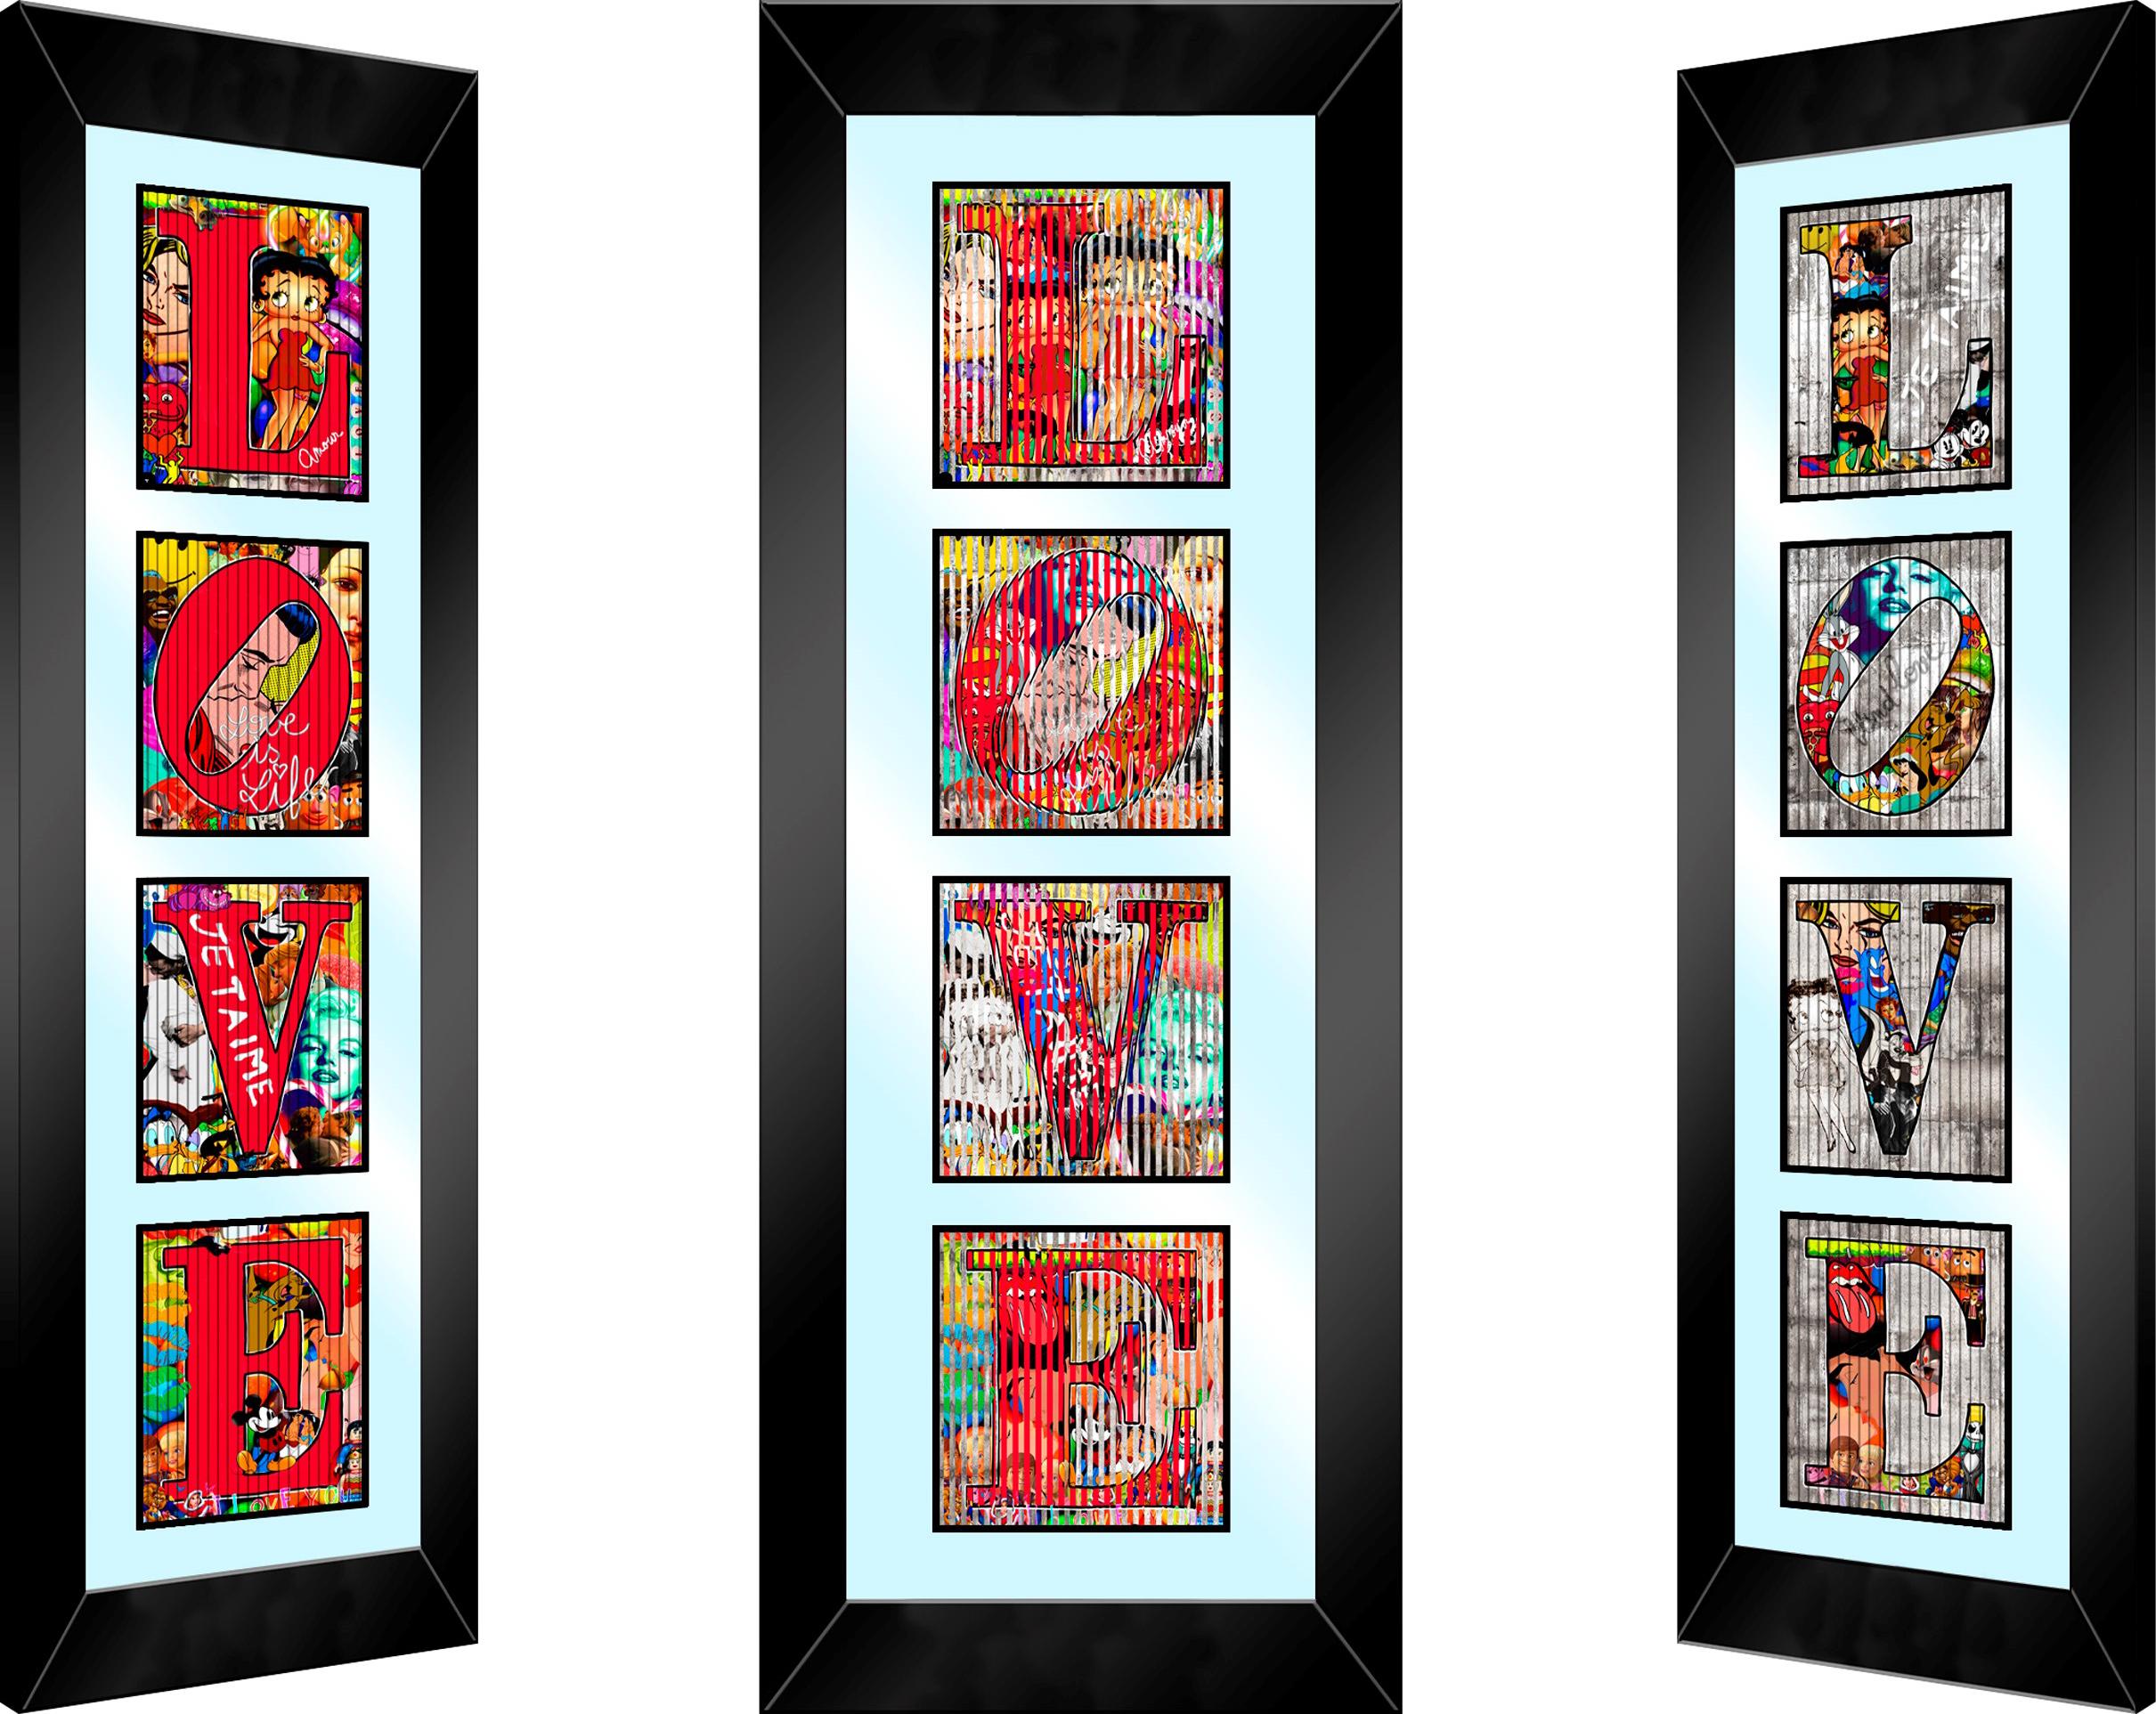 Patrick Rubinstein - Le Vertige de l'amour , 2624-012-125